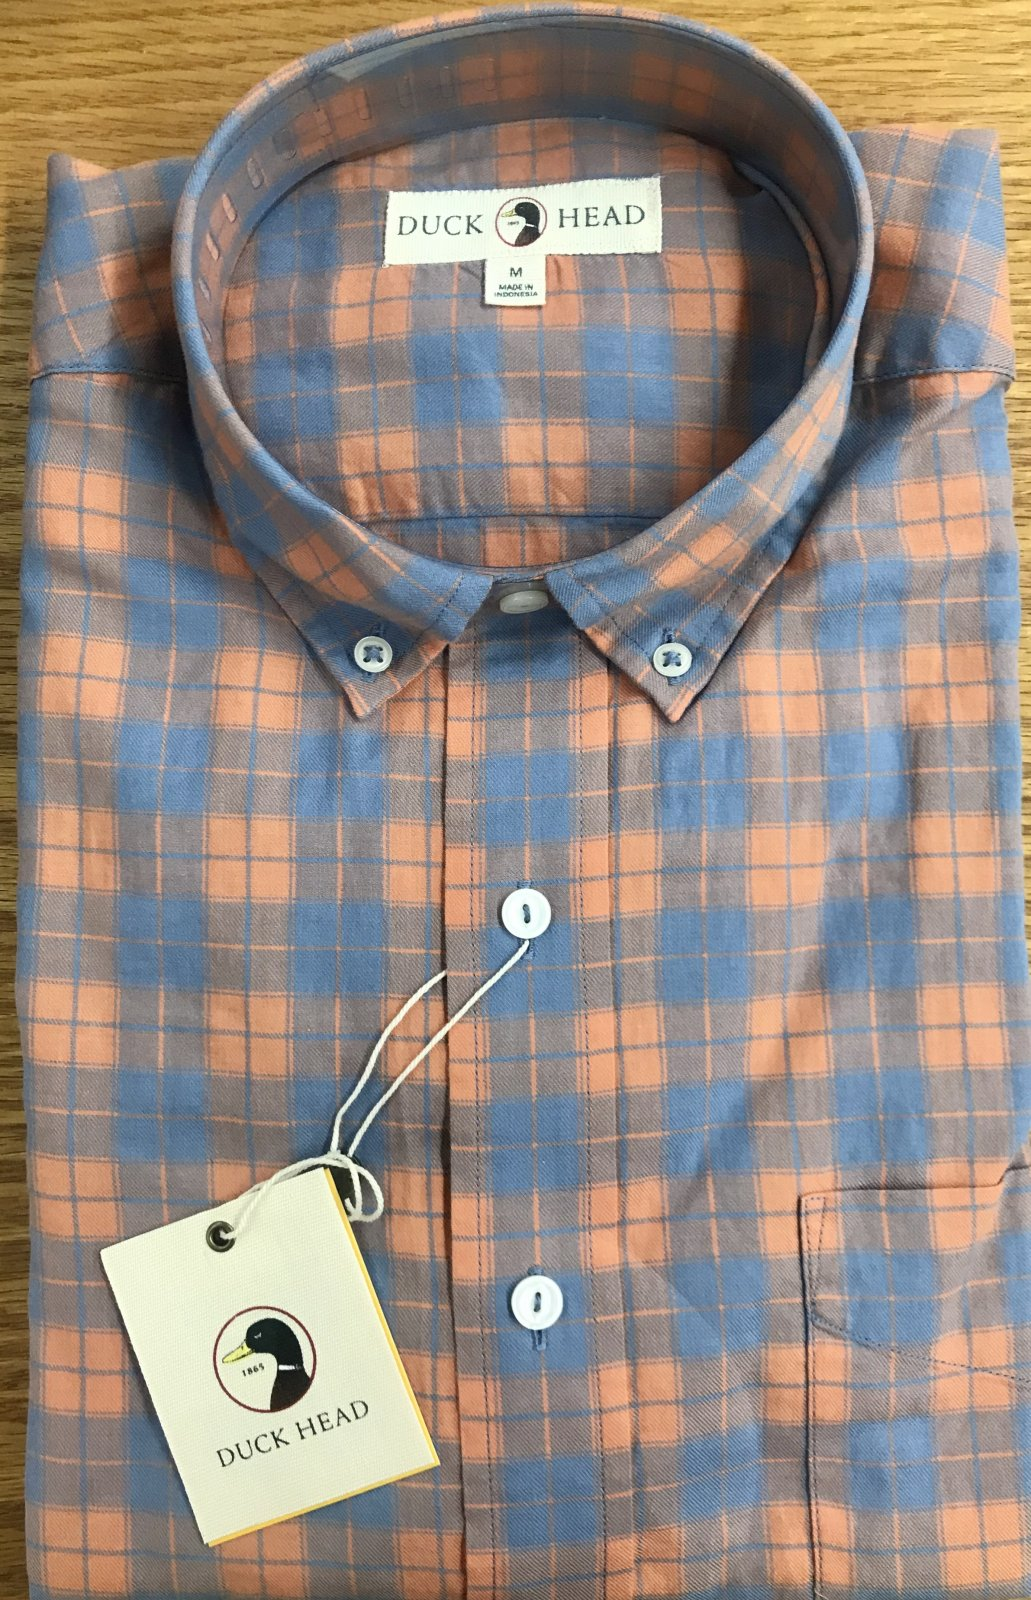 Duckhead D1-1034 Marshfield Plaid Shirt D1-1034